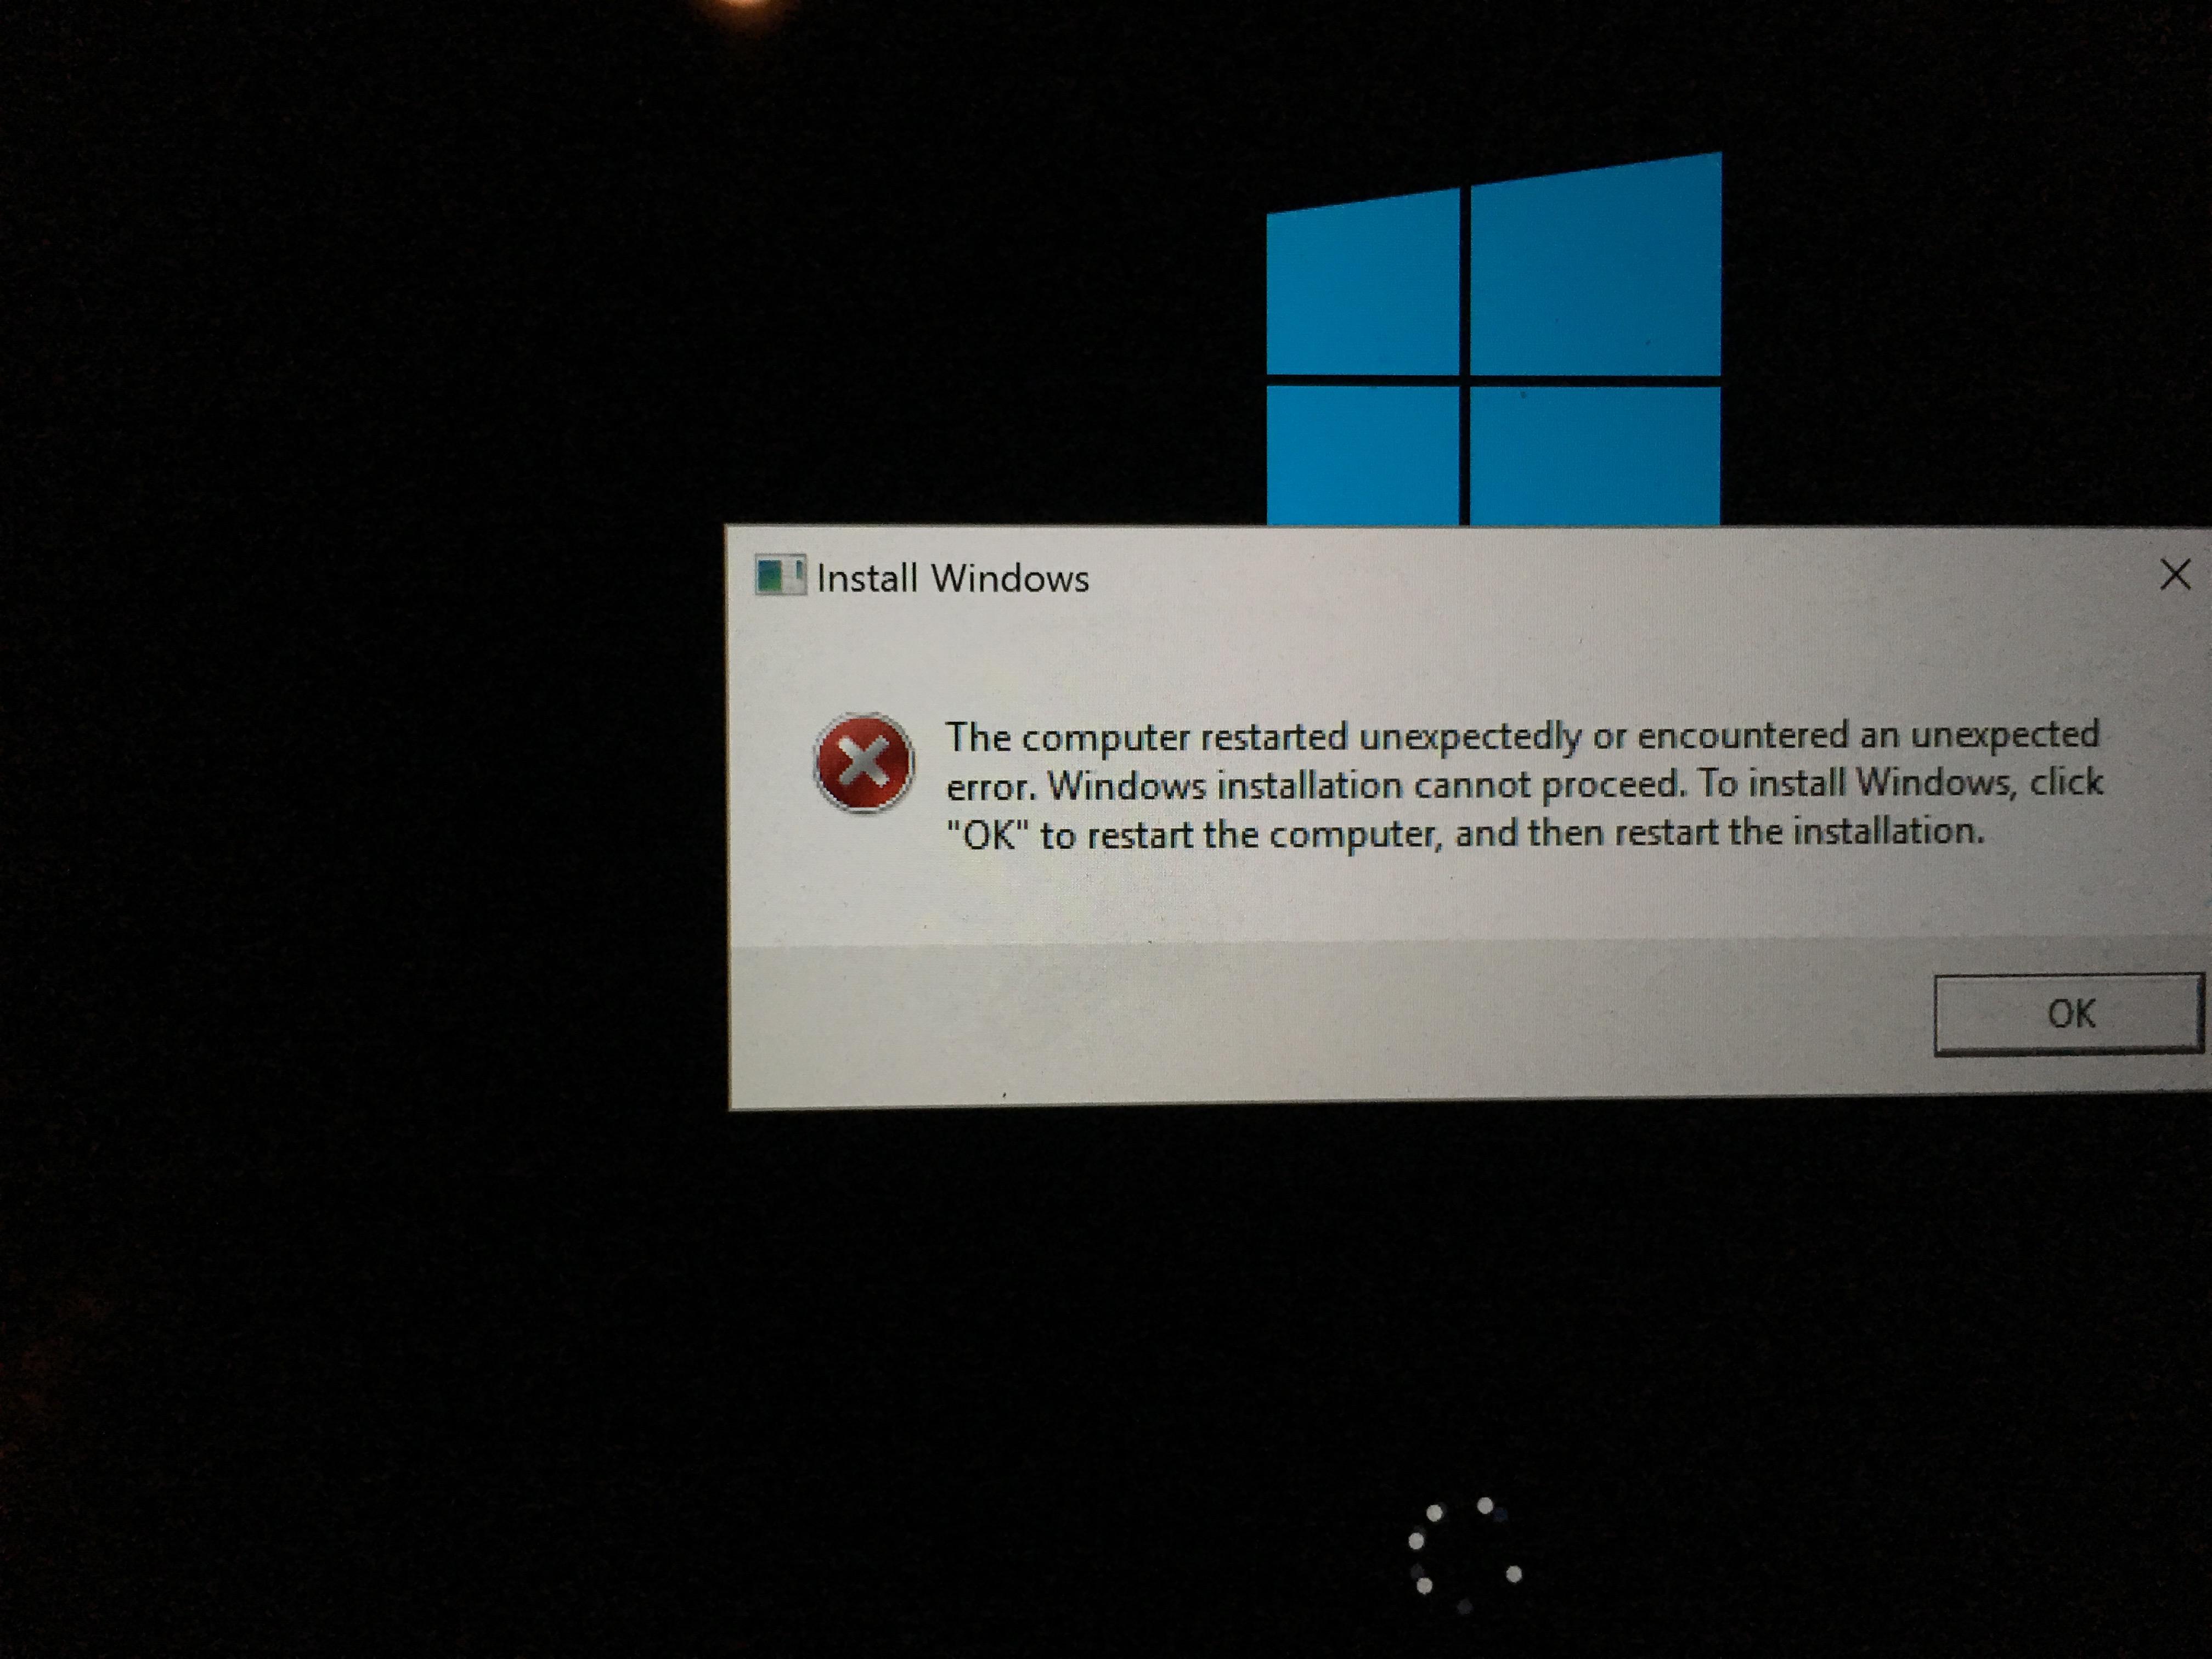 Boot Camp Windows 10 Install